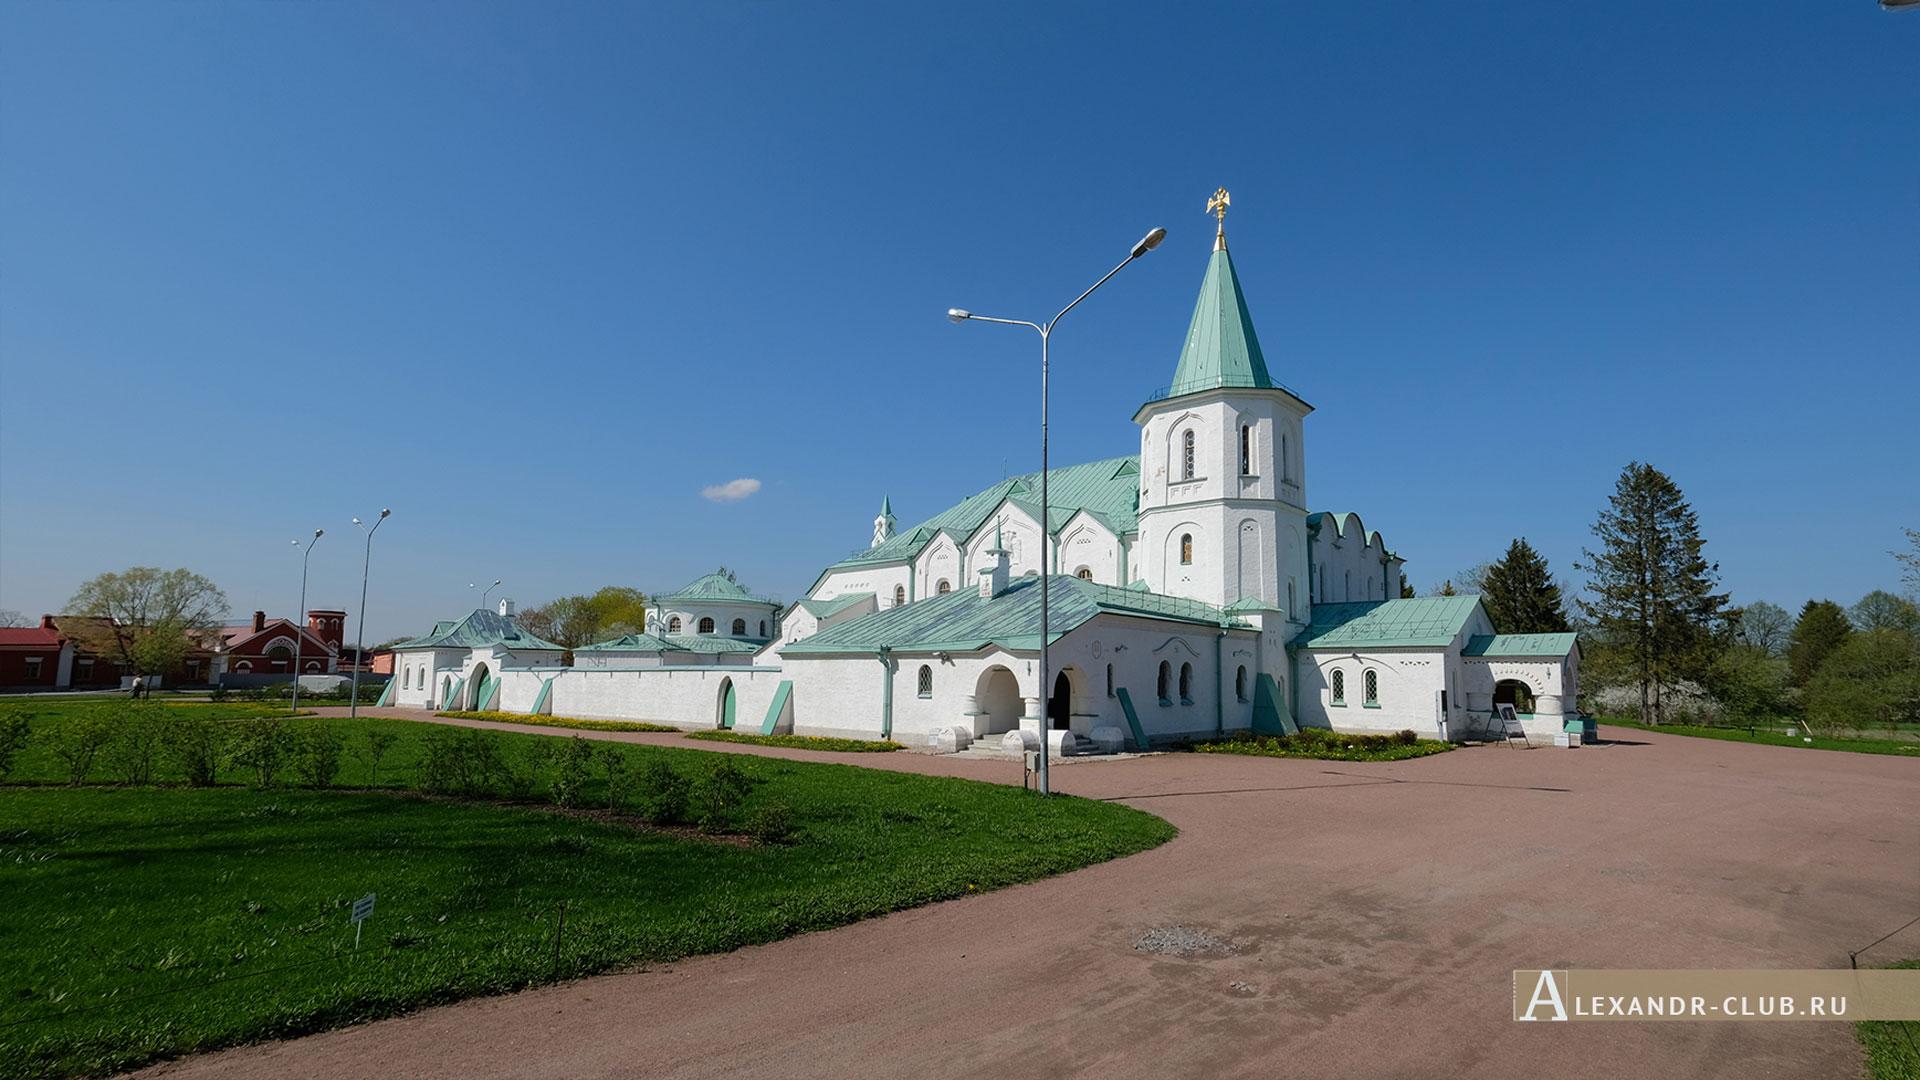 Царское Село, Александровский парк, весна, Ратная палата